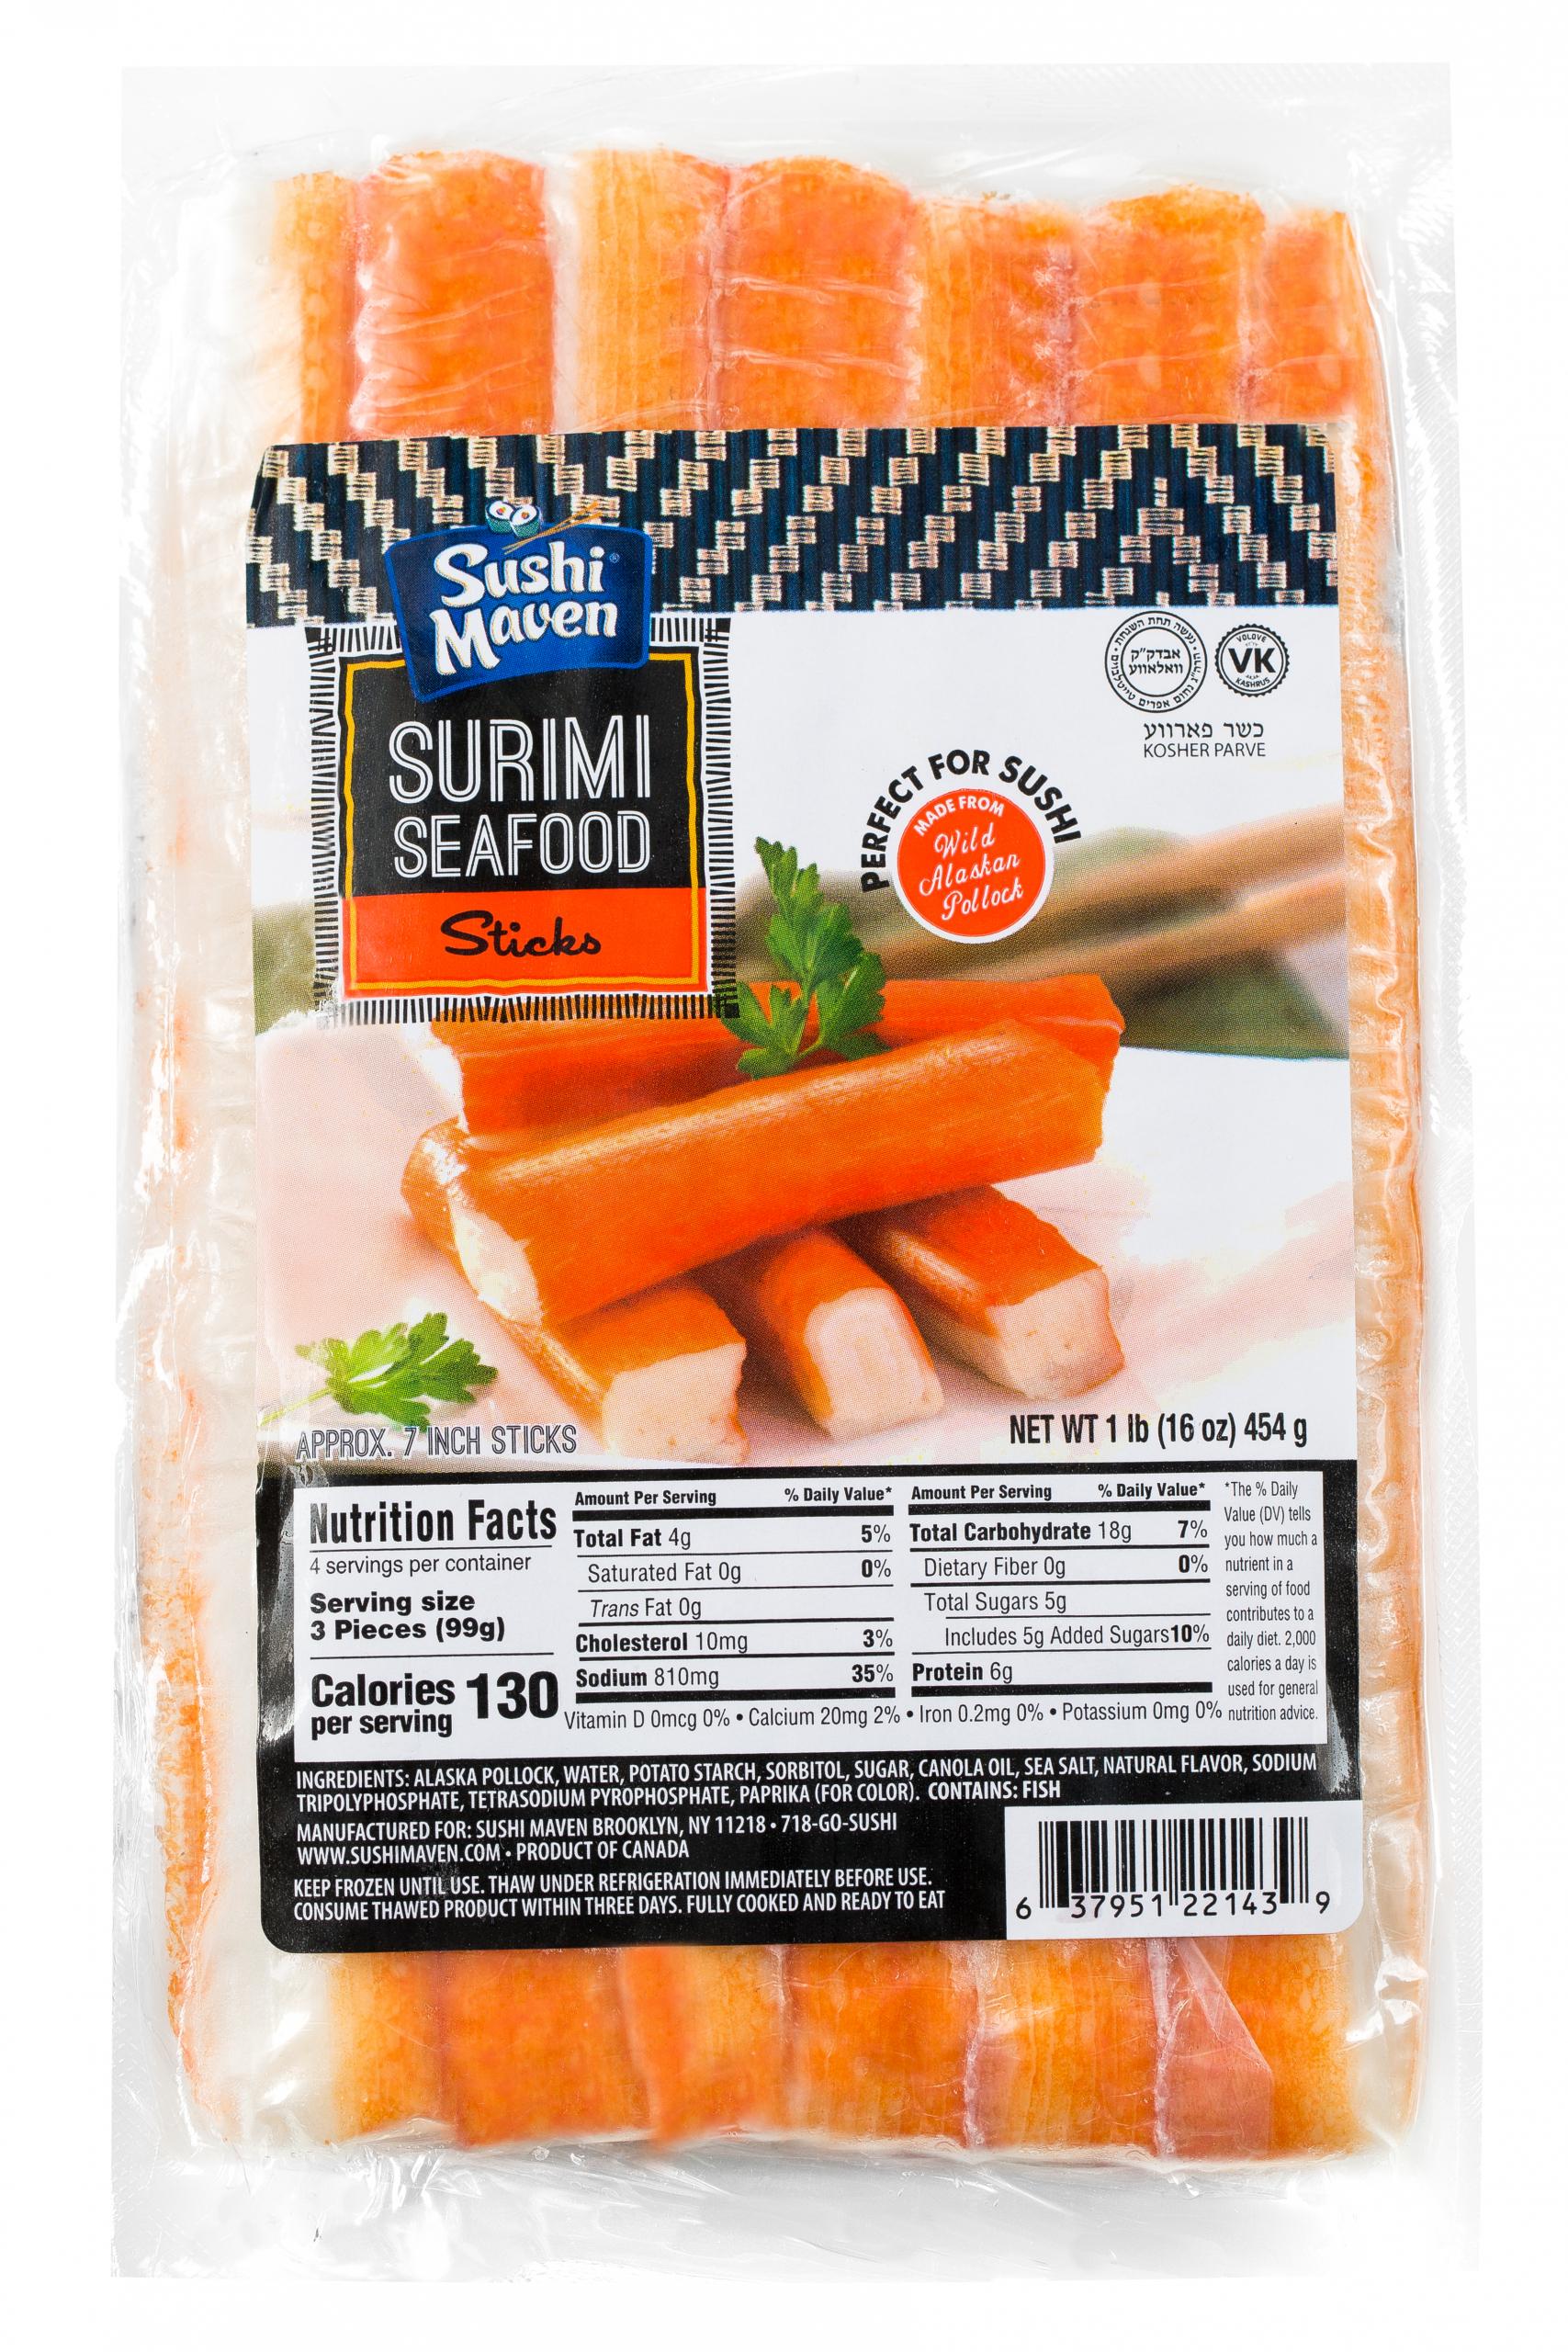 c1brlzij_sushi_maven_smb32